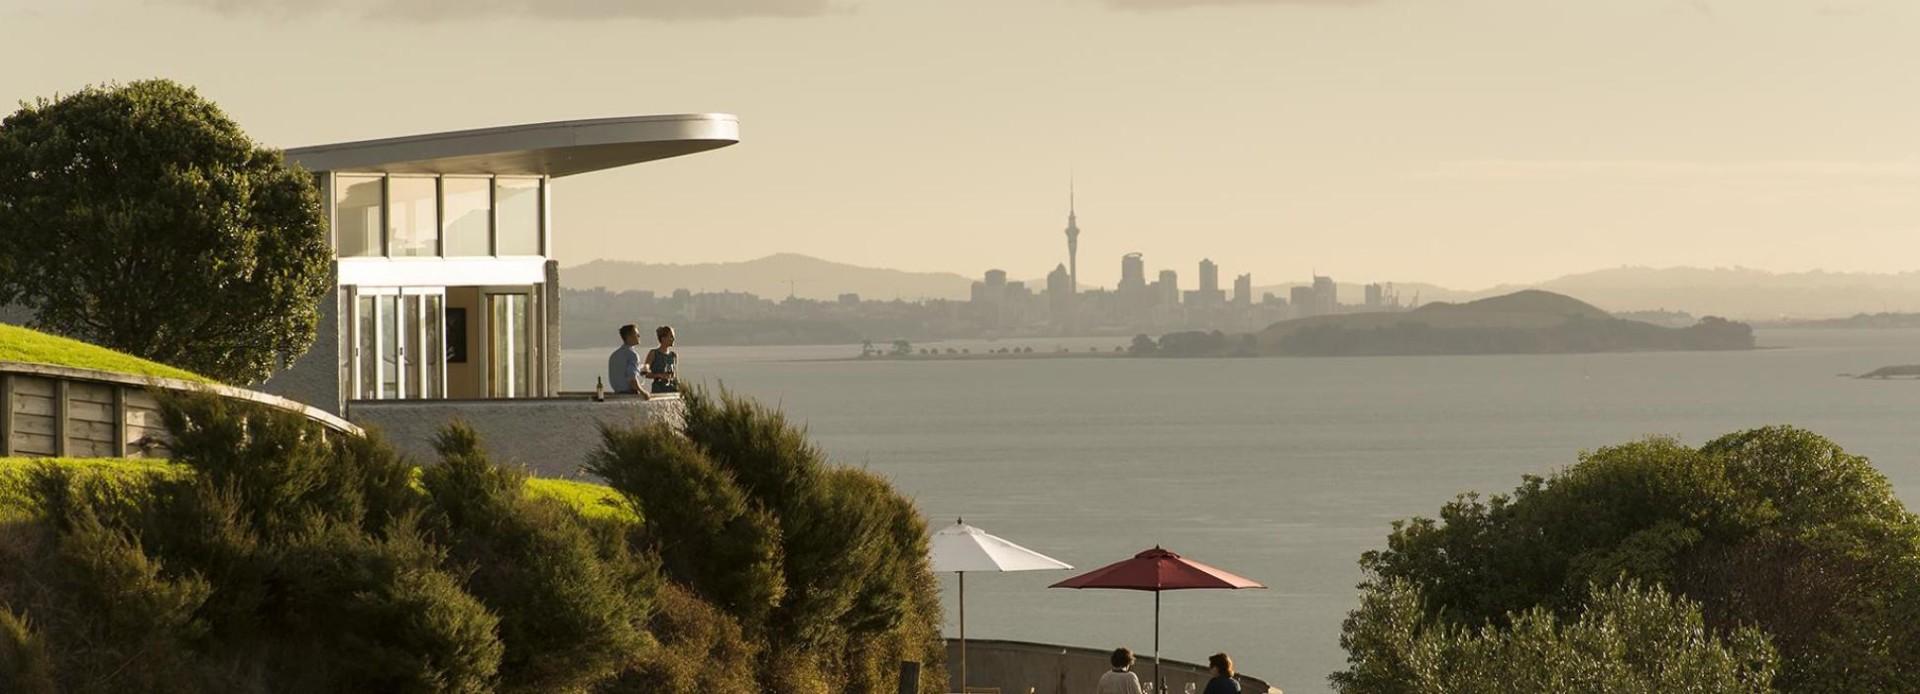 Neuseeland - Waiheke Island